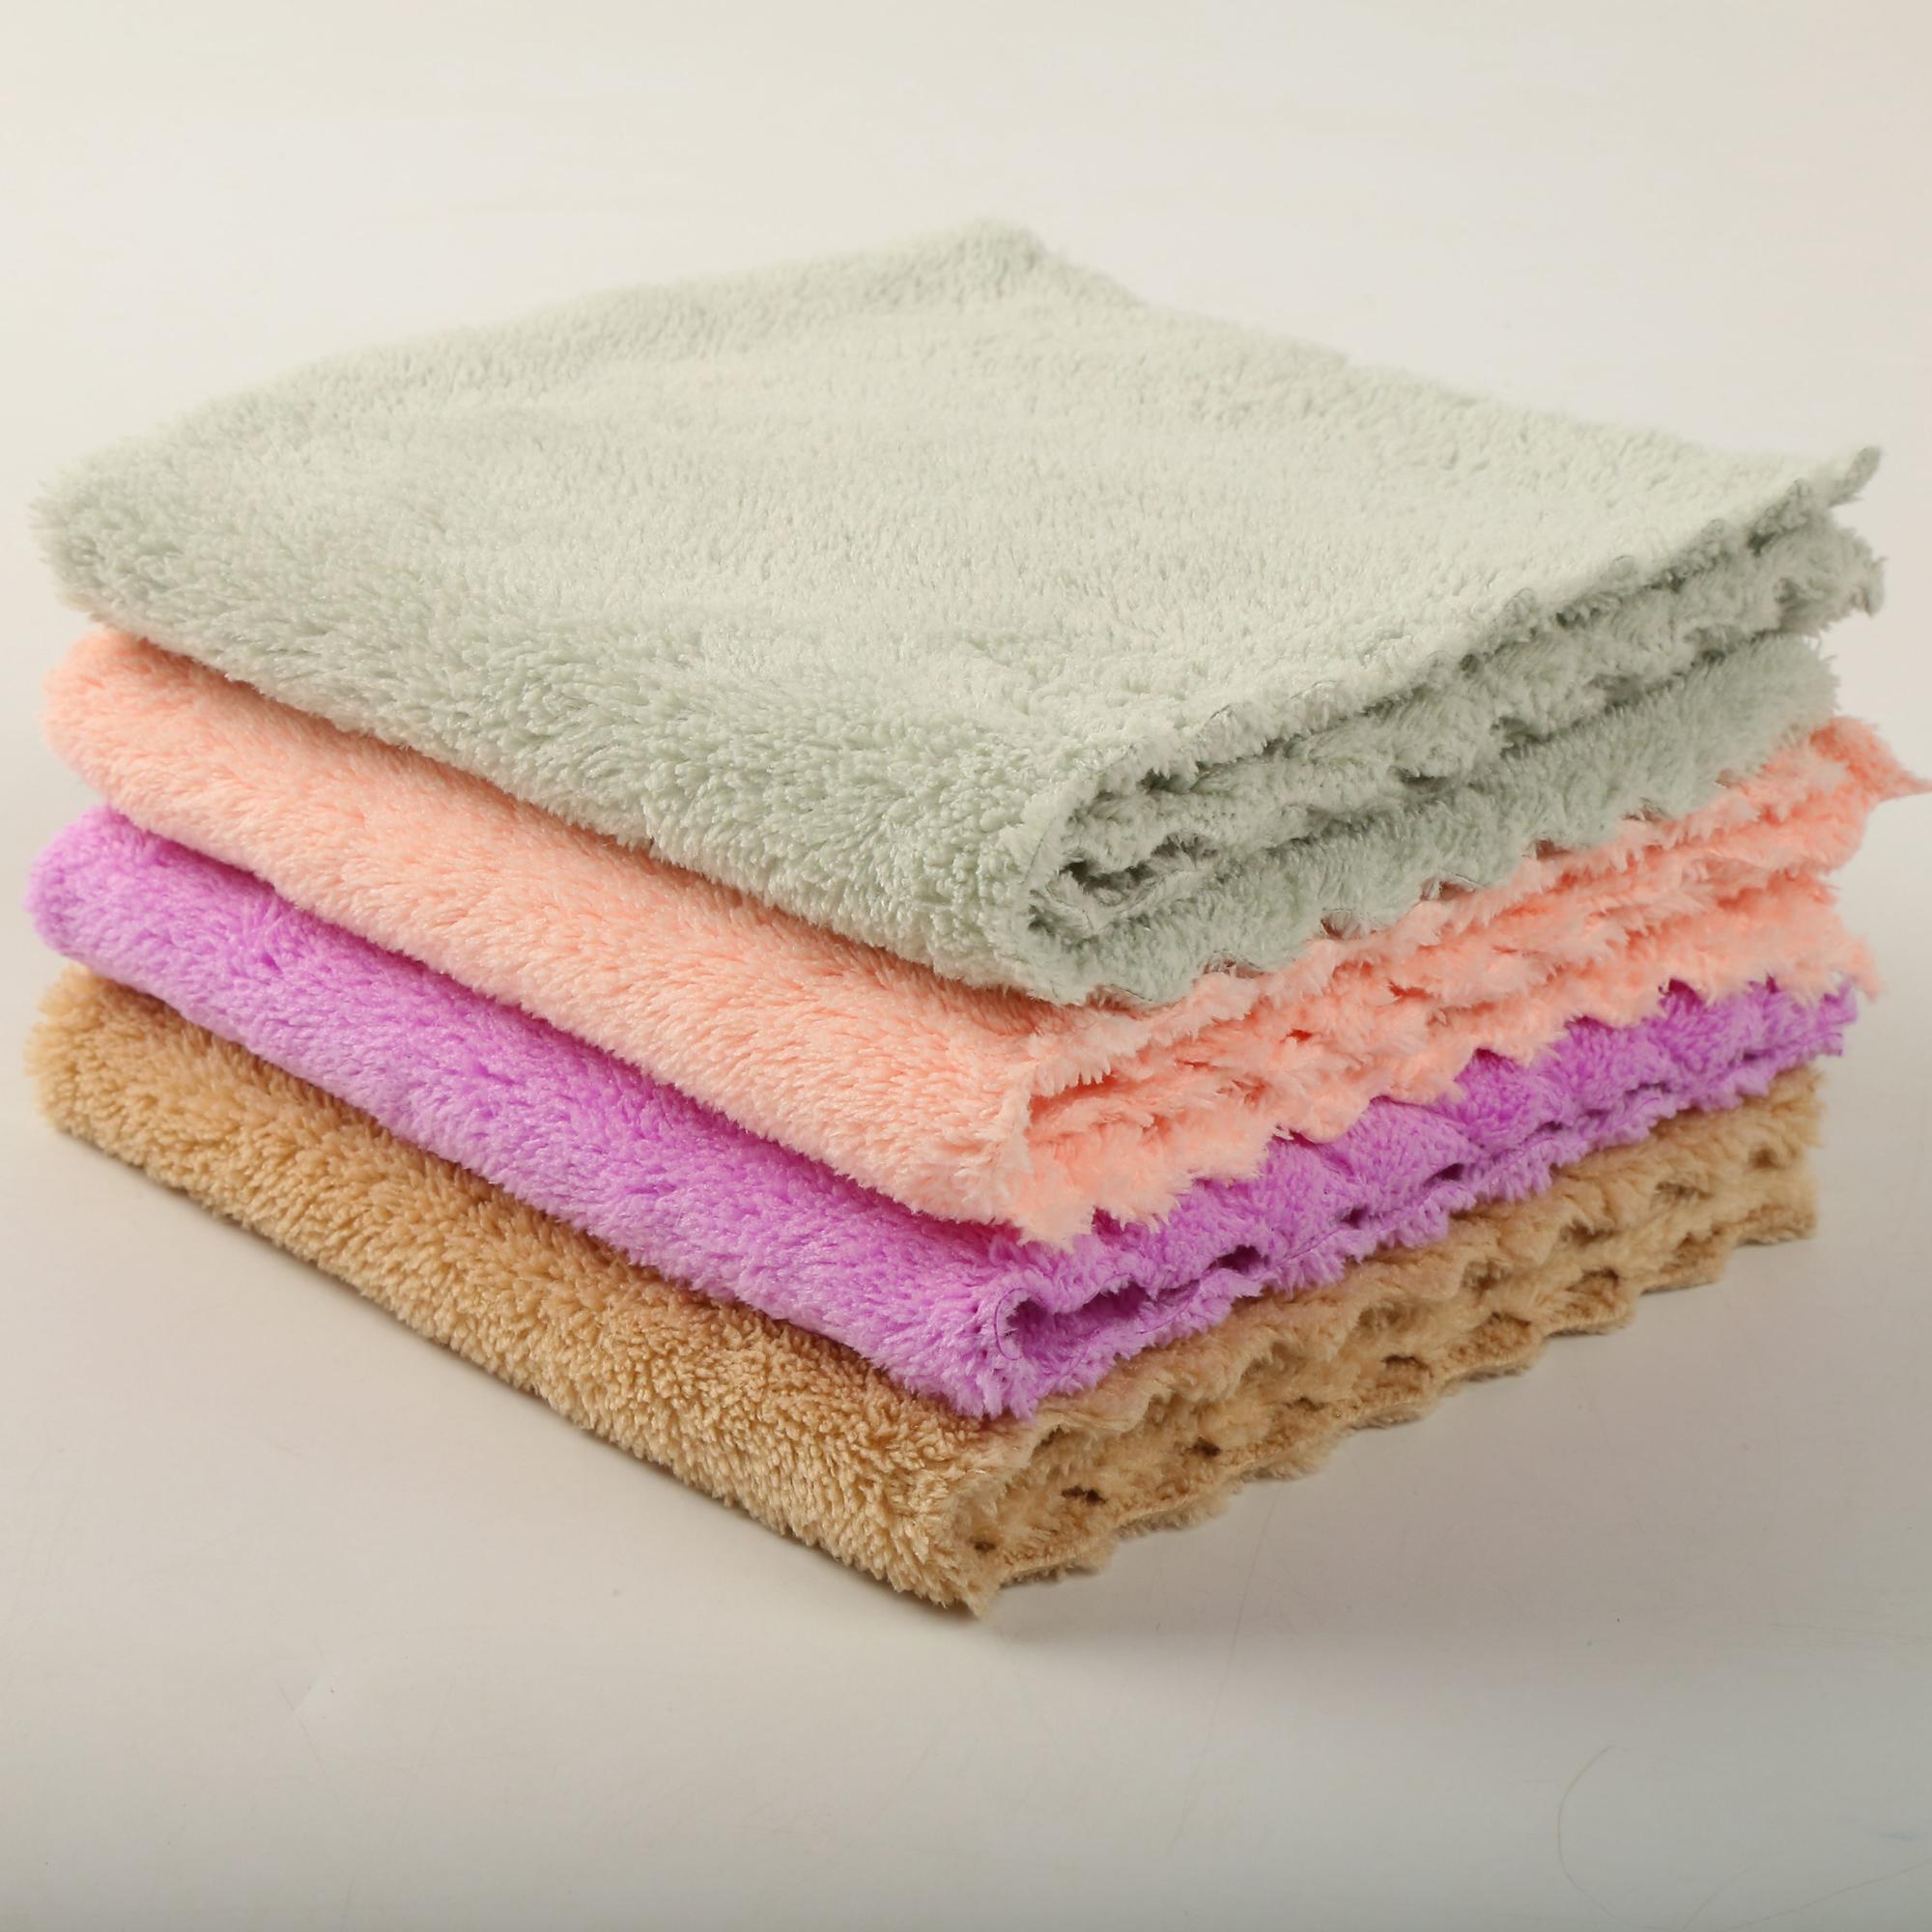 Customised size eurow 두 번-측 terry 천 두 번 loop 드레싱 eco fabric 마이크로 화이버의 셔닐 실 coral fleece face 수건